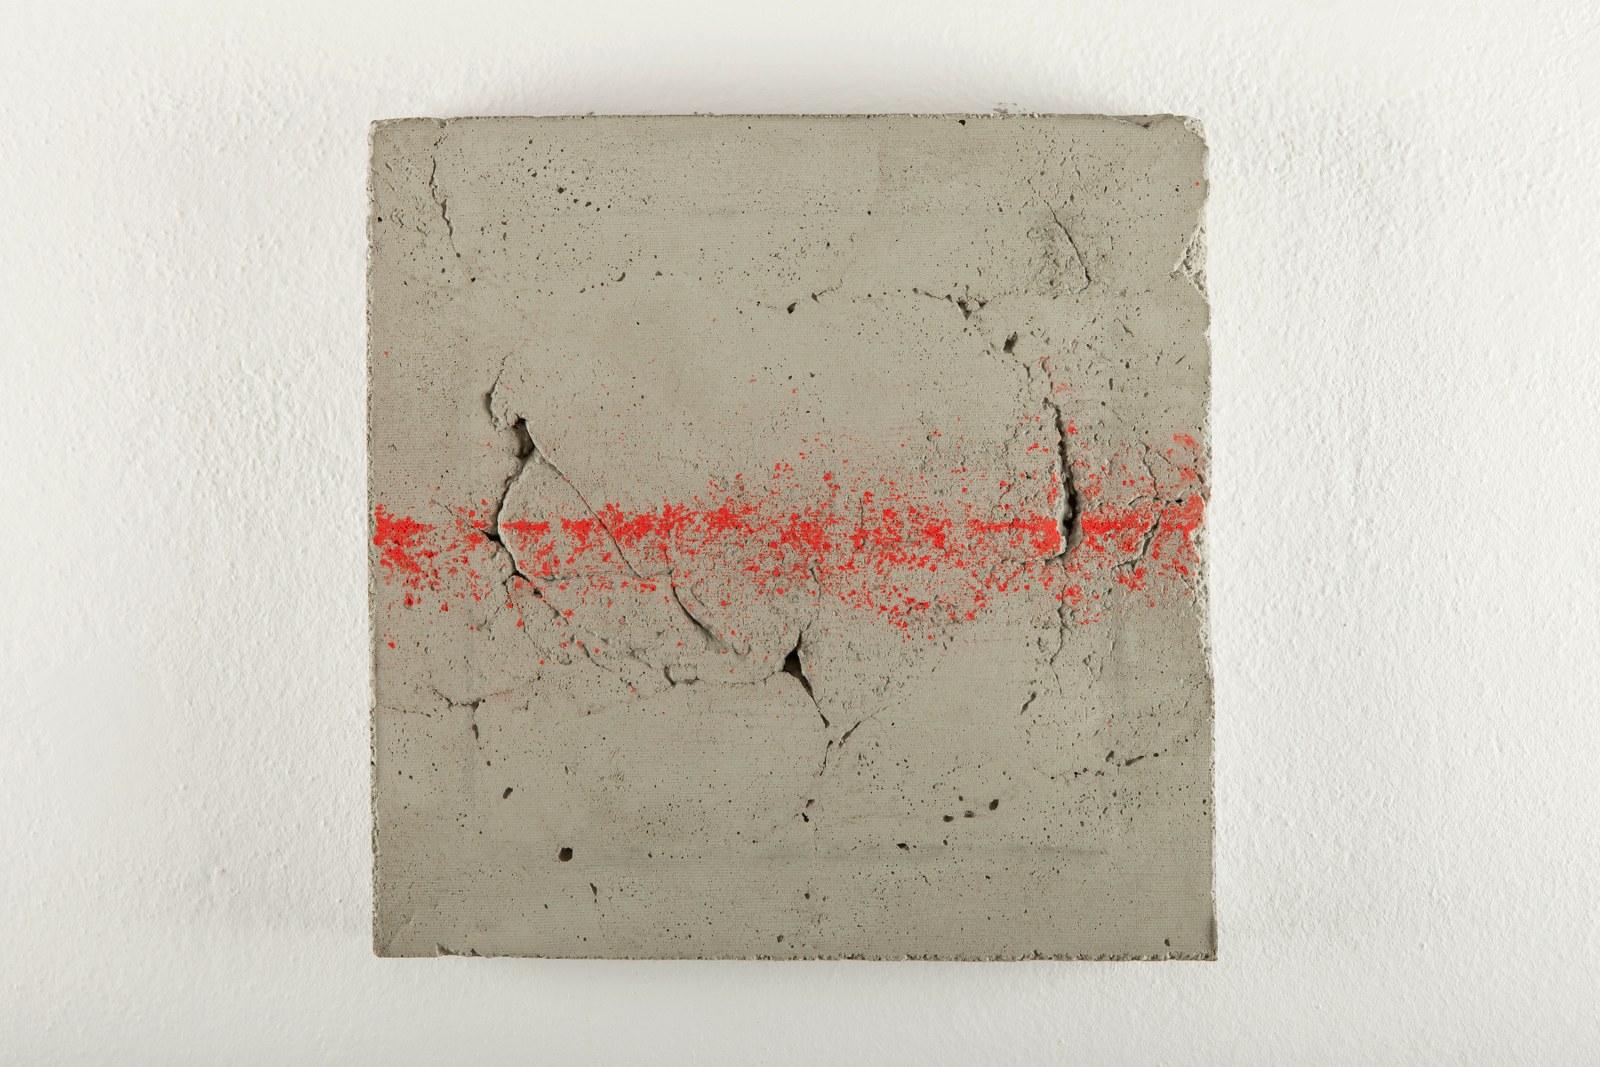 01. larosa cemento e pigmento 30x30 2013_1600x1067